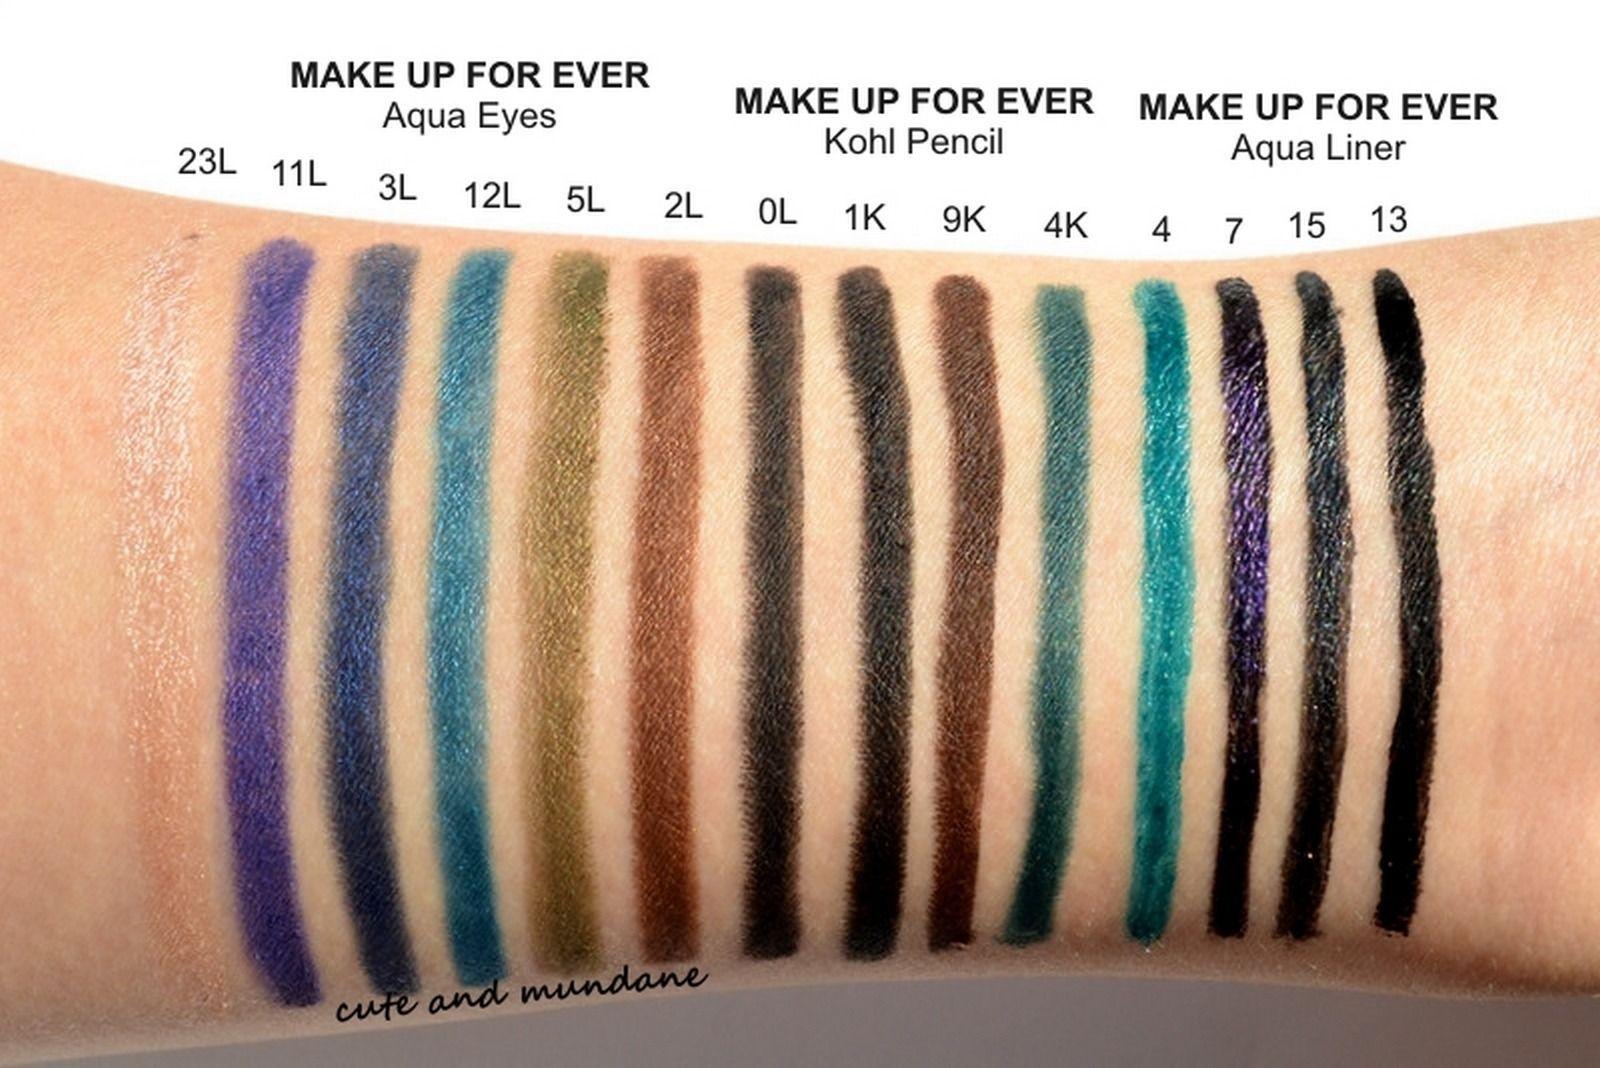 Aqua Liner by Make Up For Ever #10